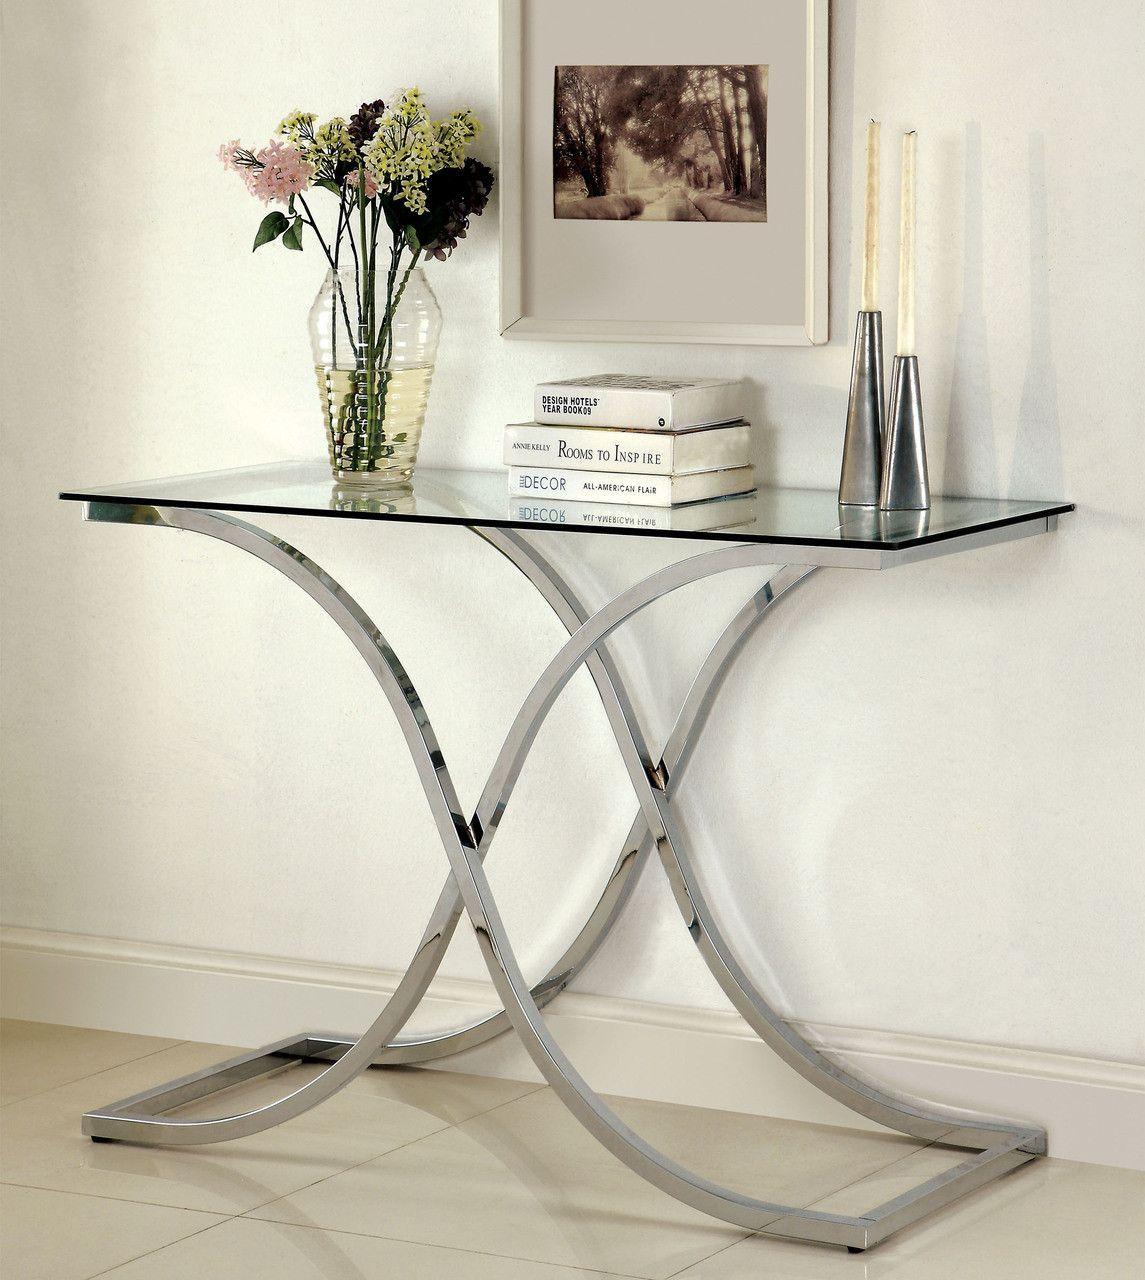 Unique Sofa Tables: CM4233S Sofa Table Luxa Collection With A Unique Base